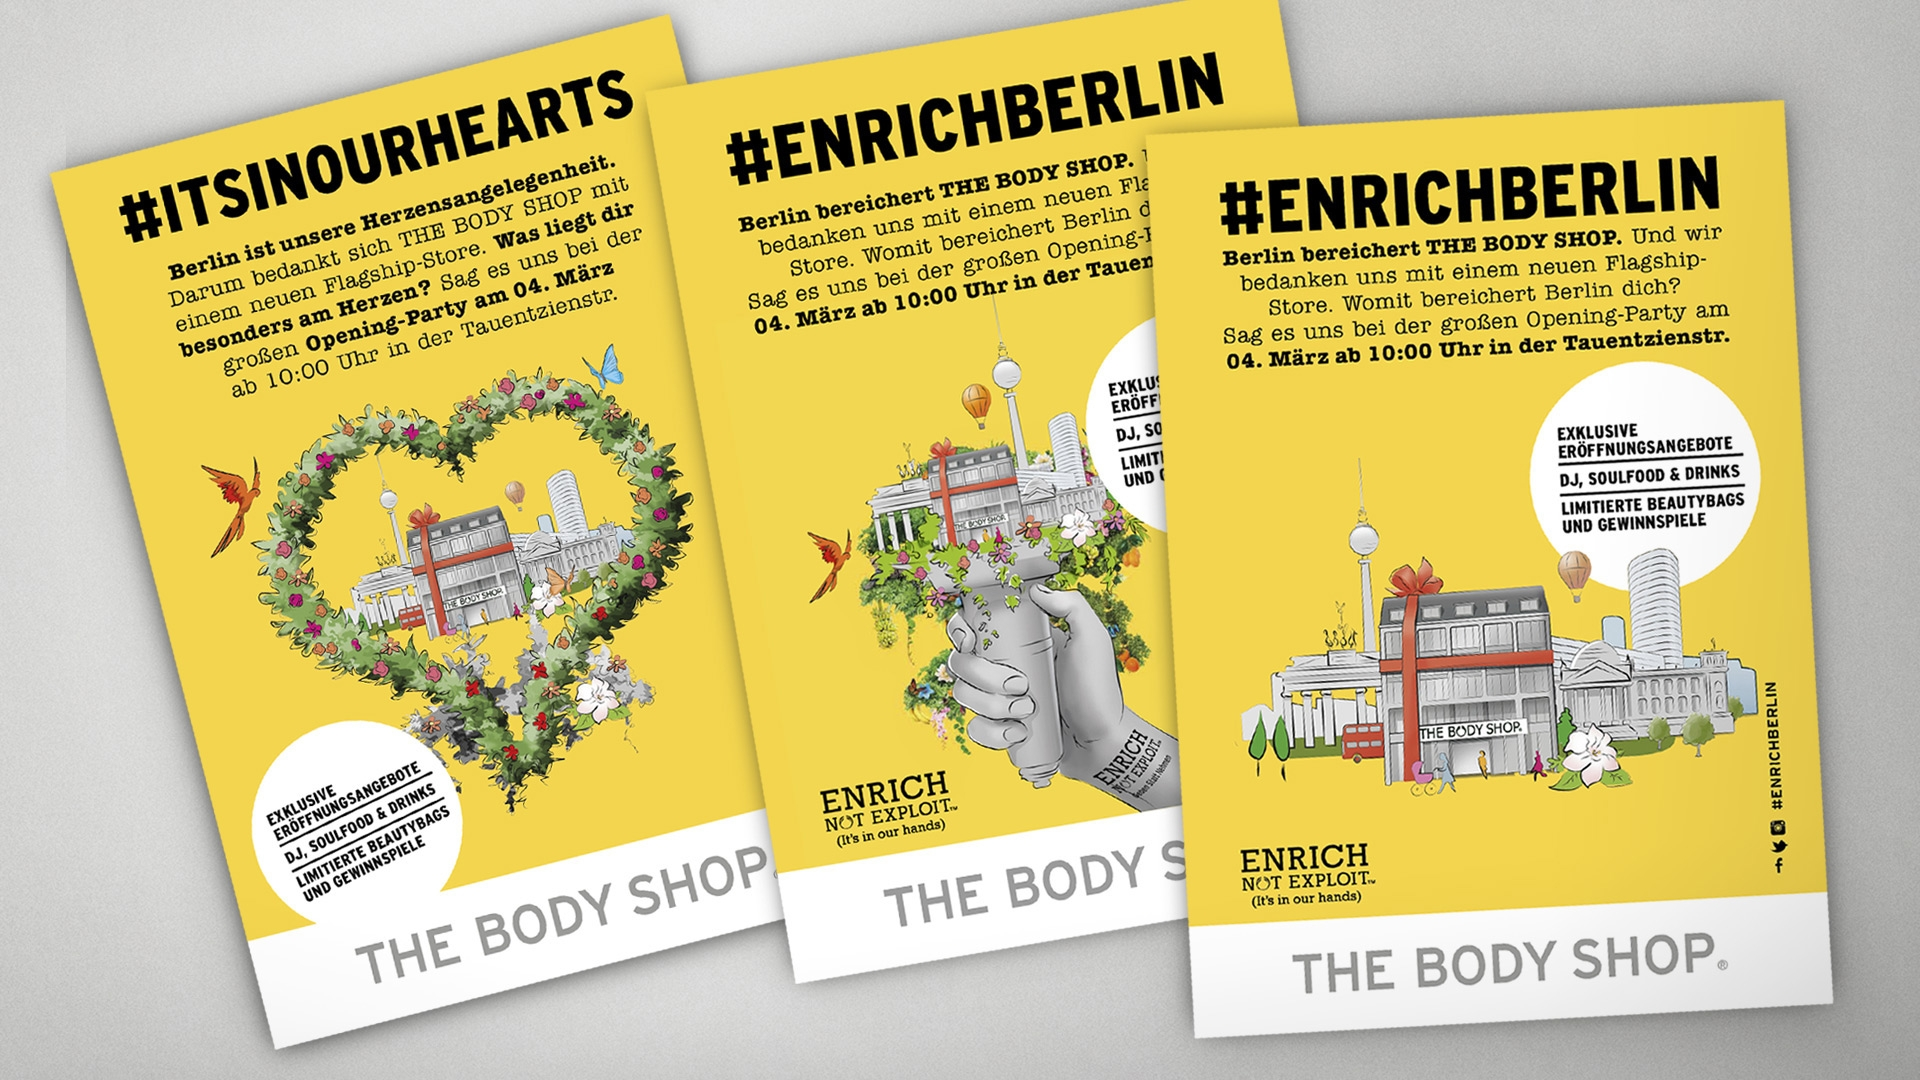 The Body Shop Berlin